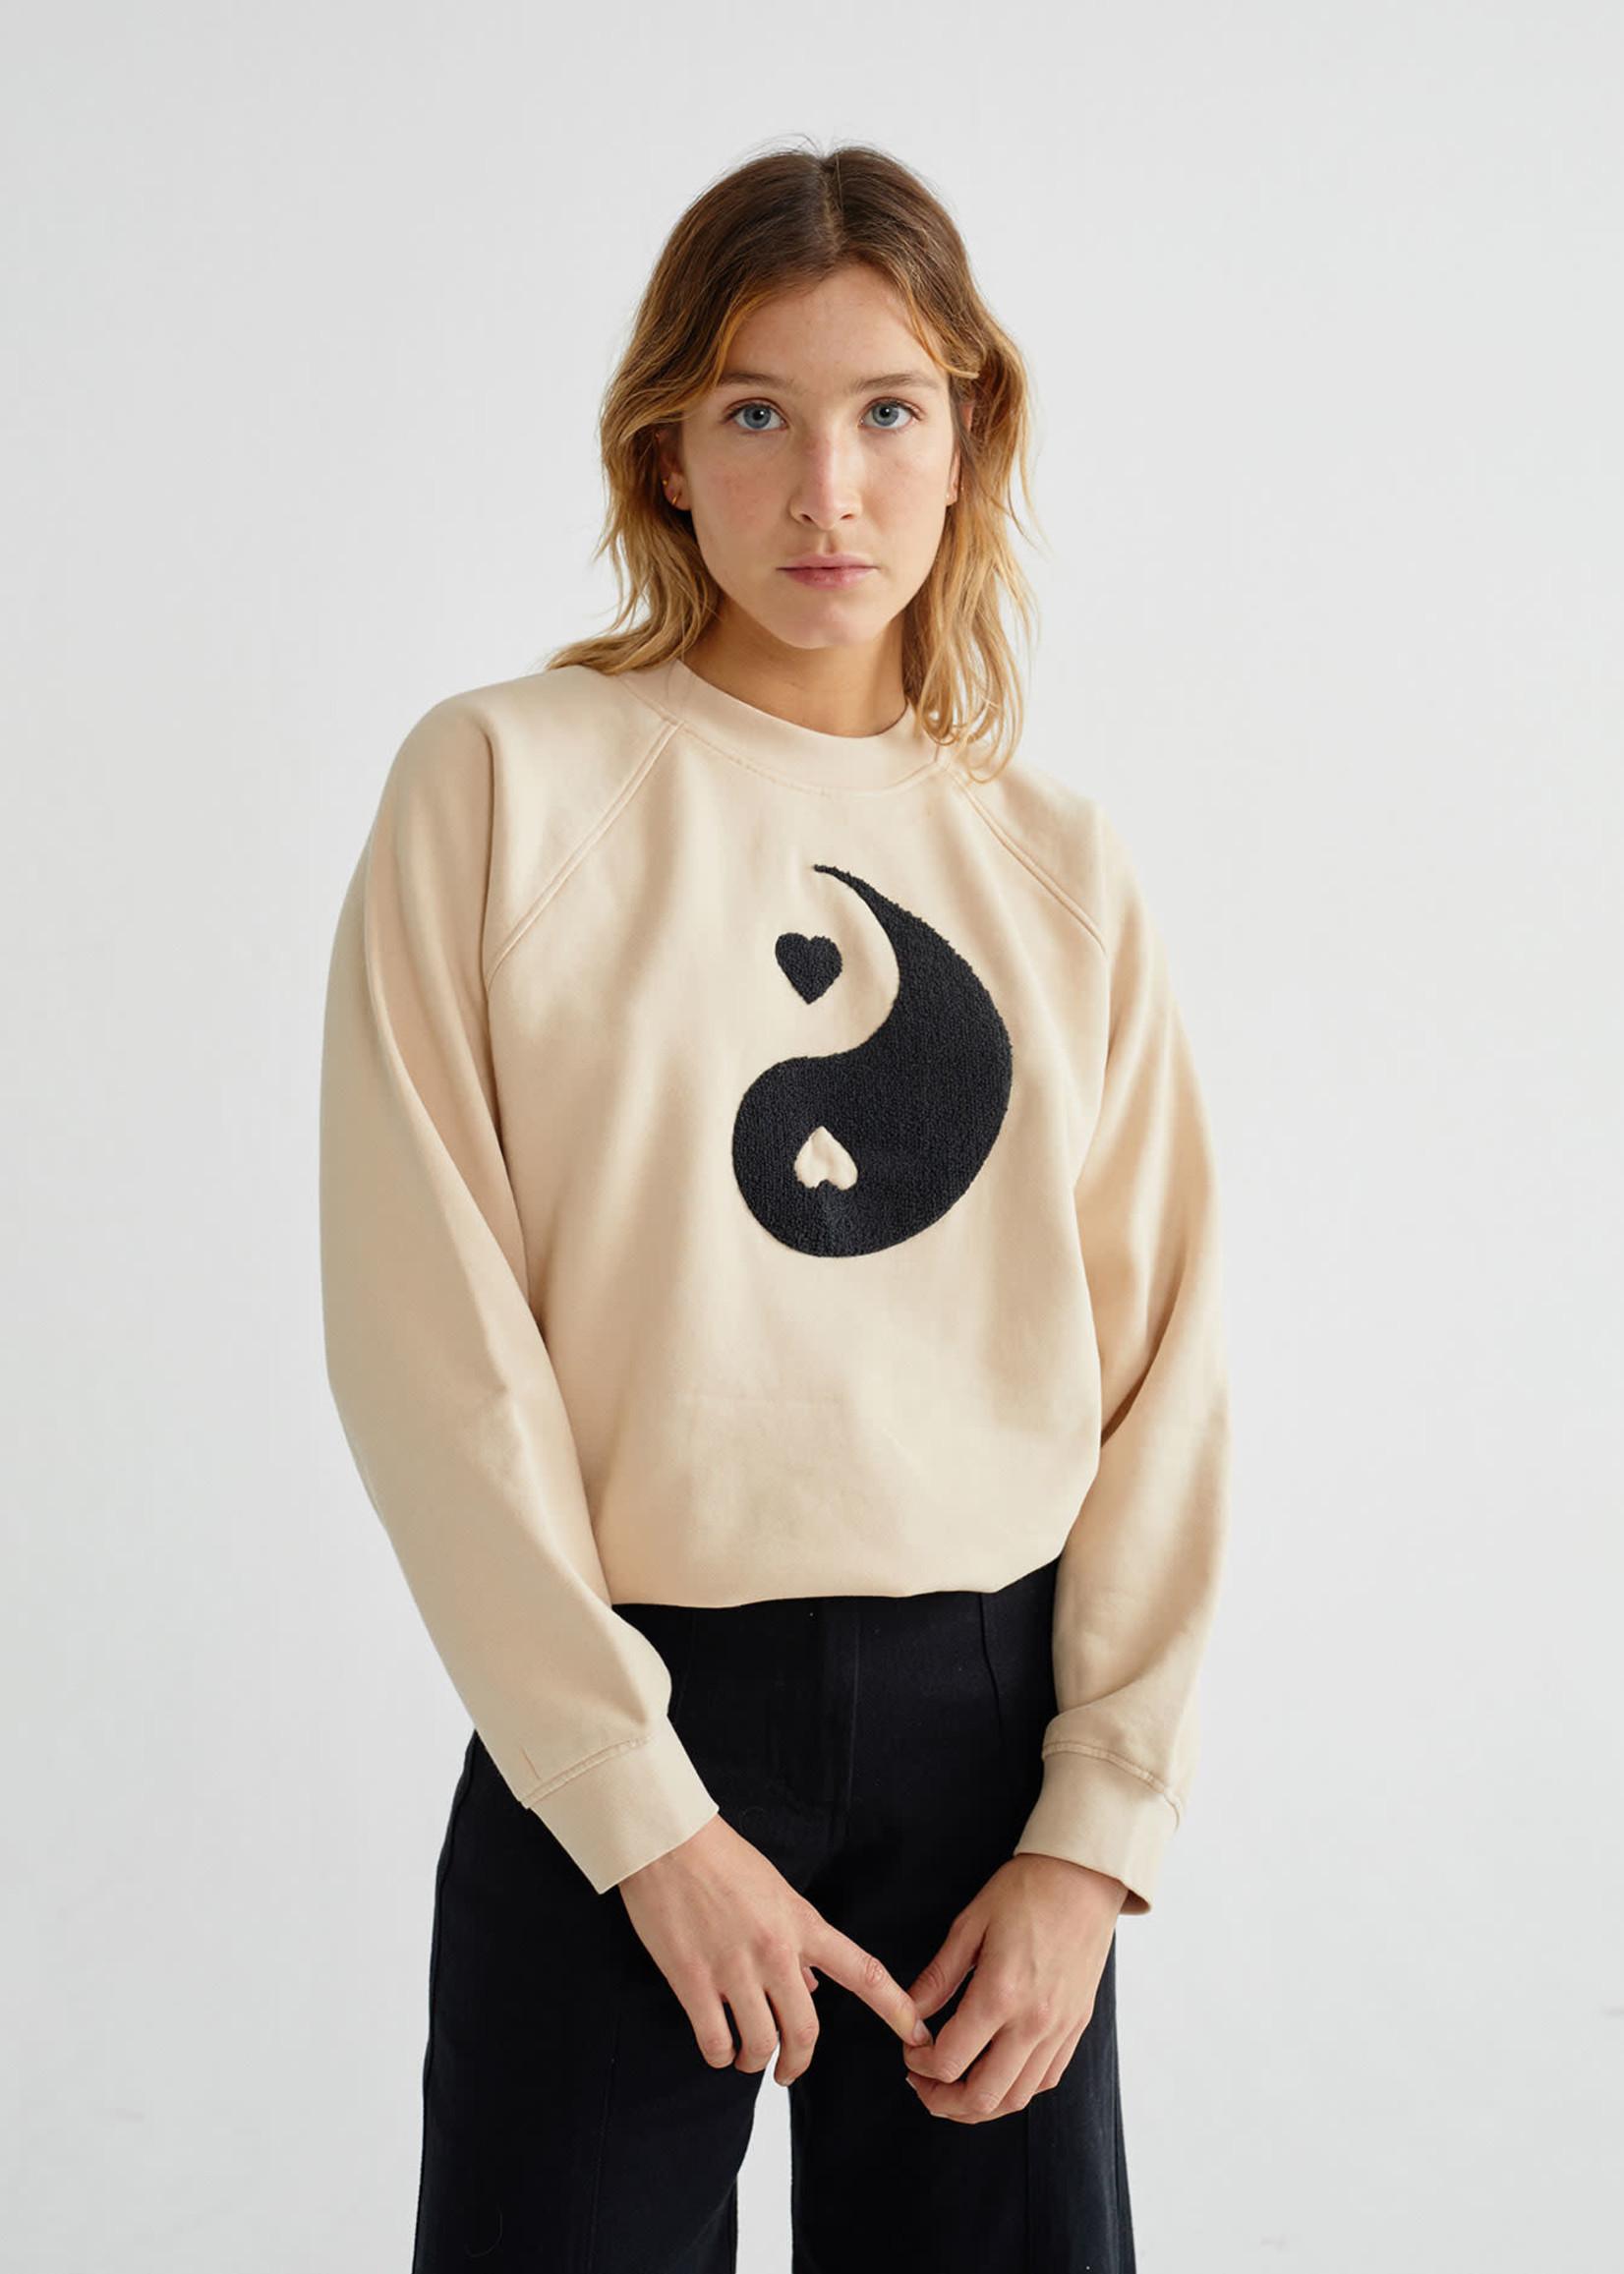 Thinking Mu Yin Yang Sweatshirt